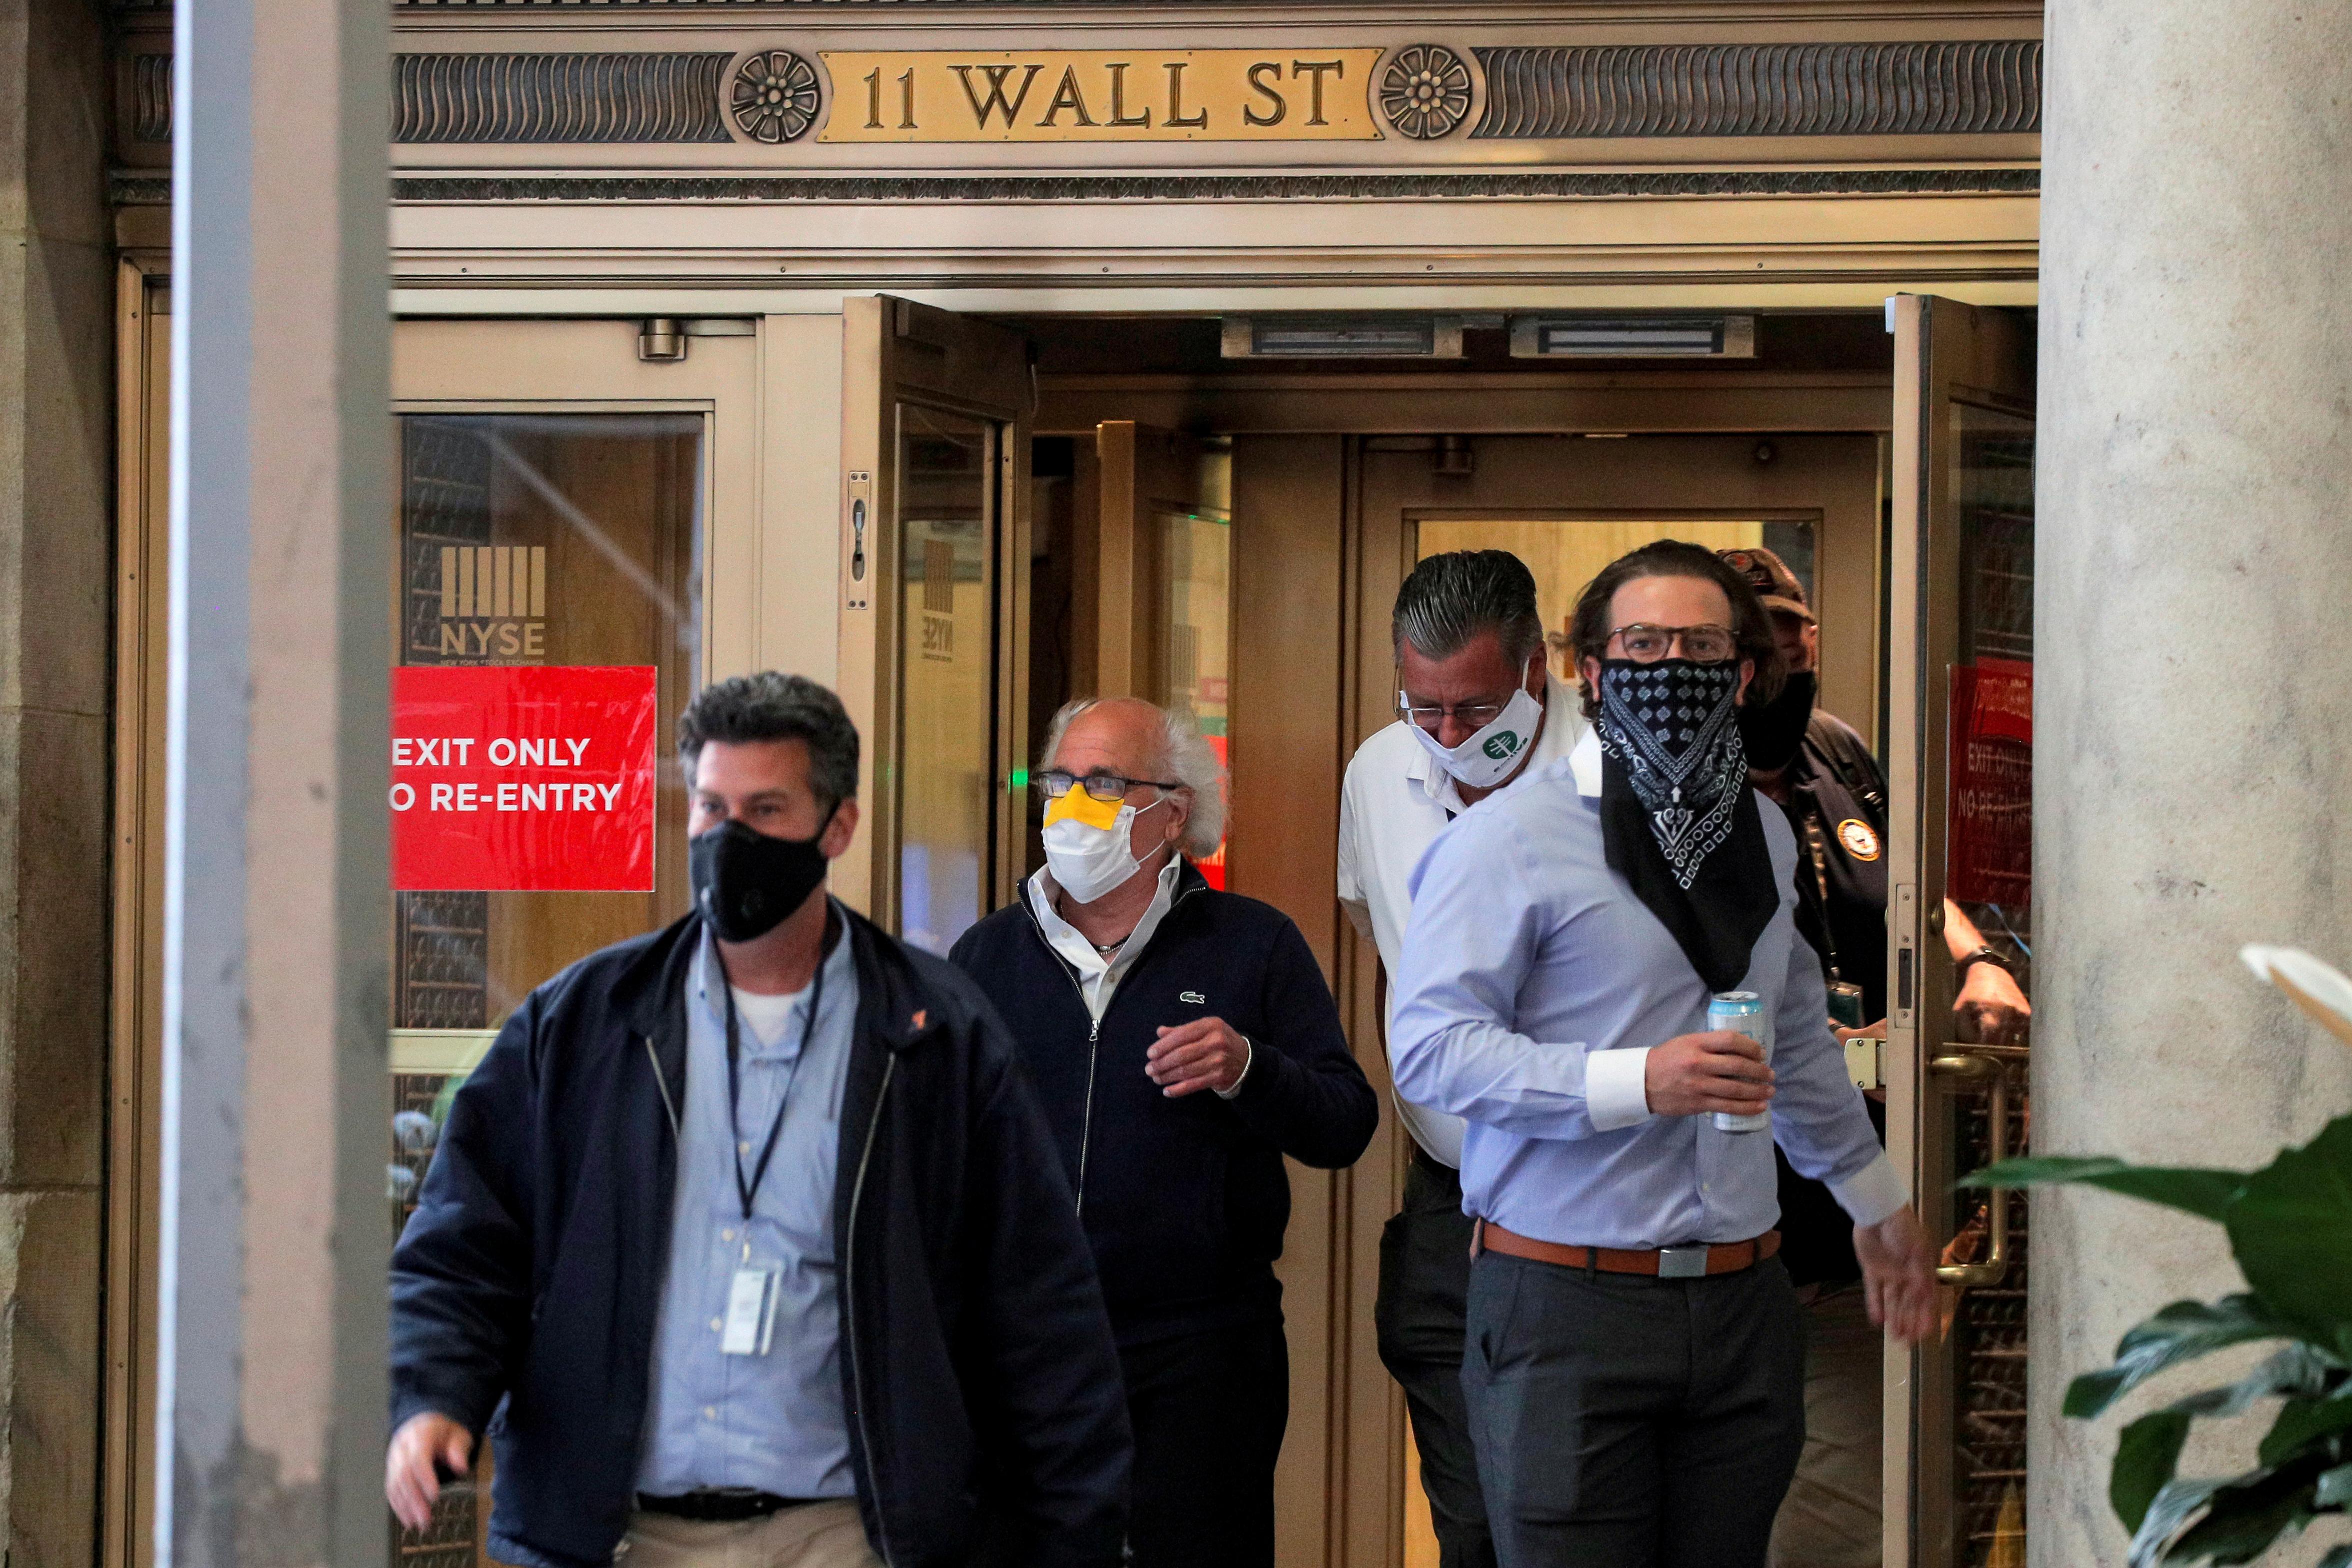 Traders exit the 11 Wall St. door of the New York Stock Exchange (NYSE) in New York City, New York, U.S., June 26, 2020. REUTERS/Brendan McDermid